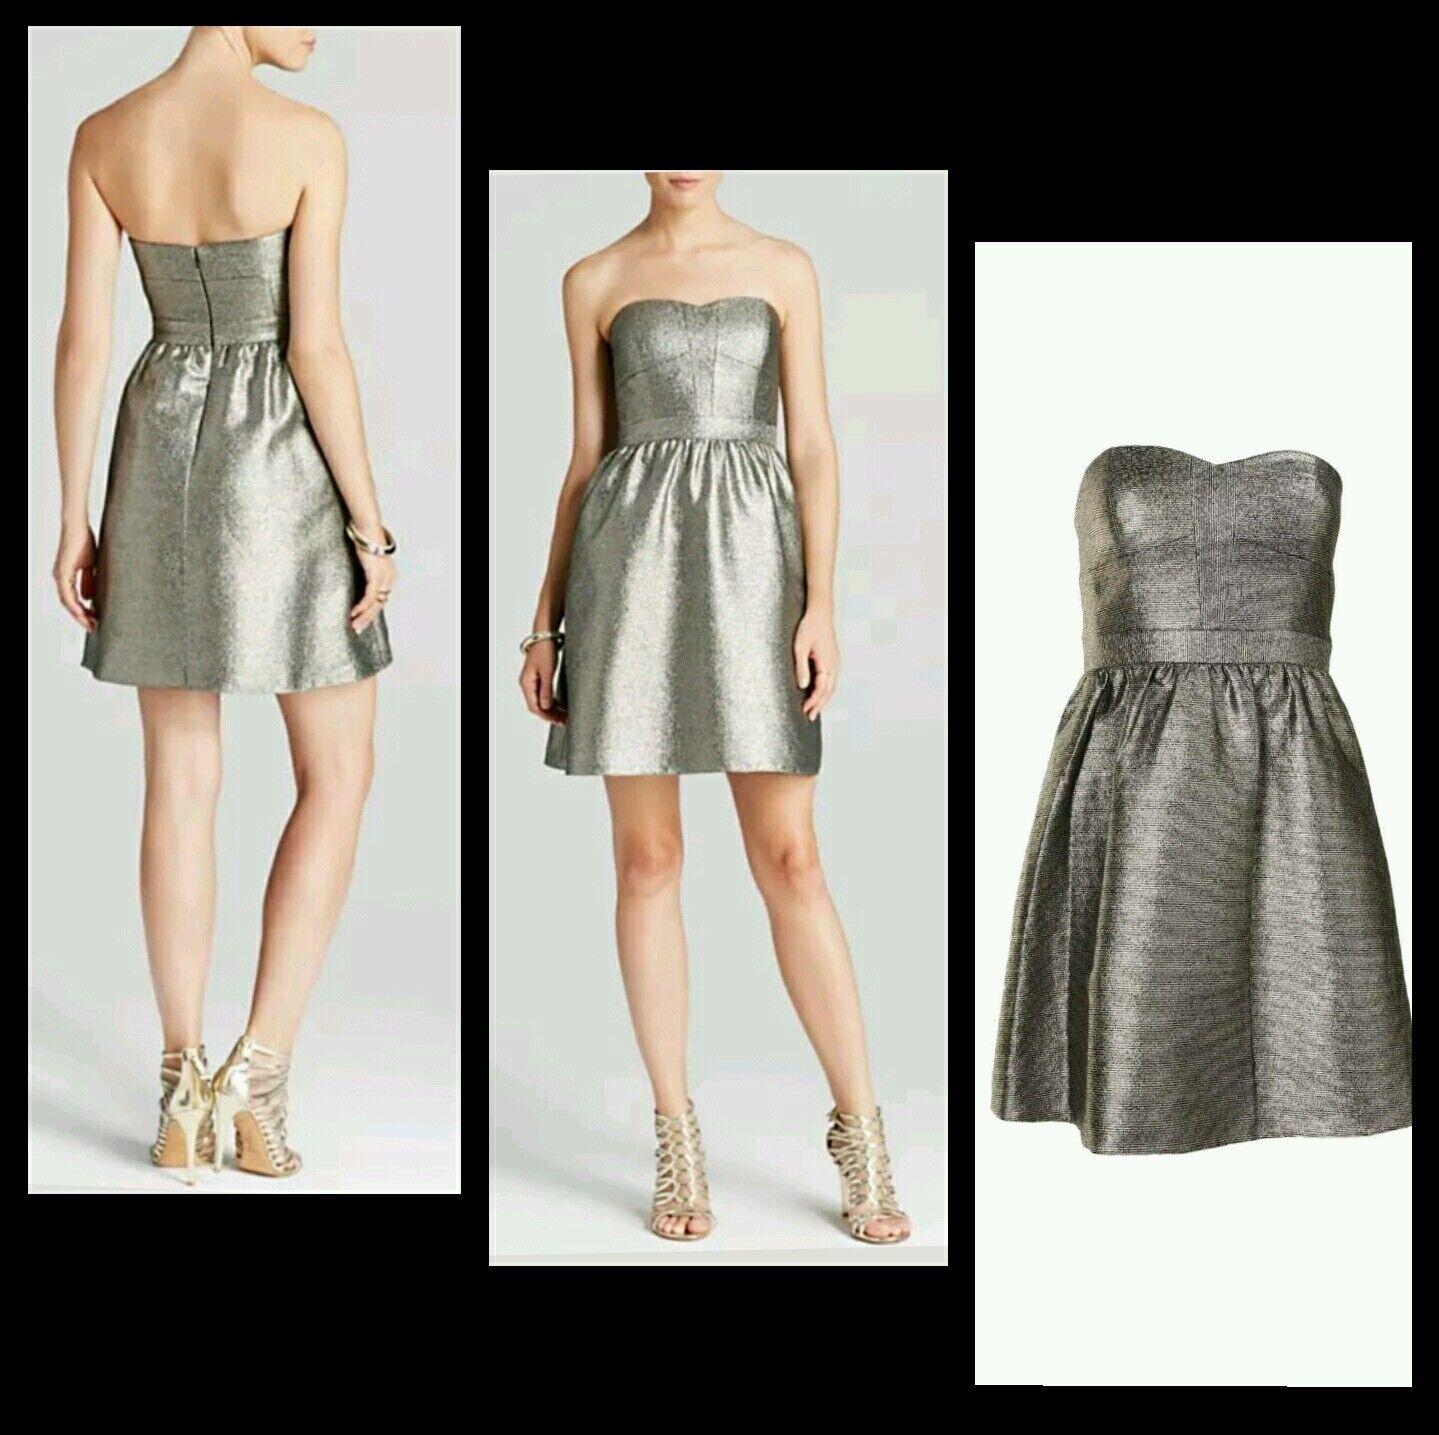 AQUA Metallic Gold Strapless Fit Flare Cocktail Party Pocket Dress8  M3020